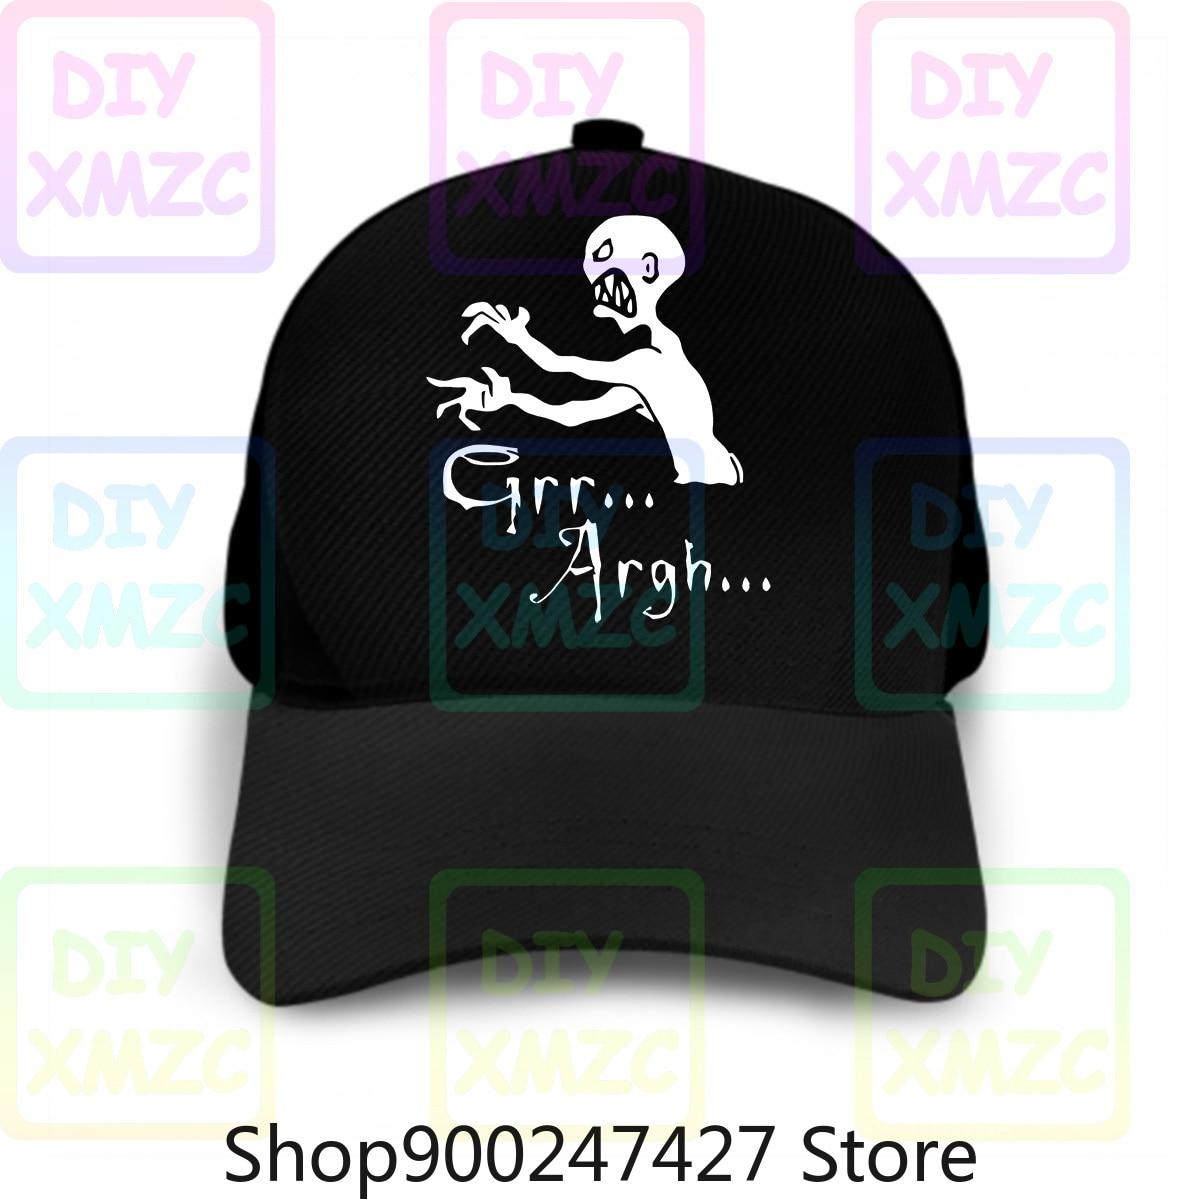 2018 streetwear hatss boné de beisebol buffy vampiro slayer masculino preto hatss chapéus vestuário preto chapéus t